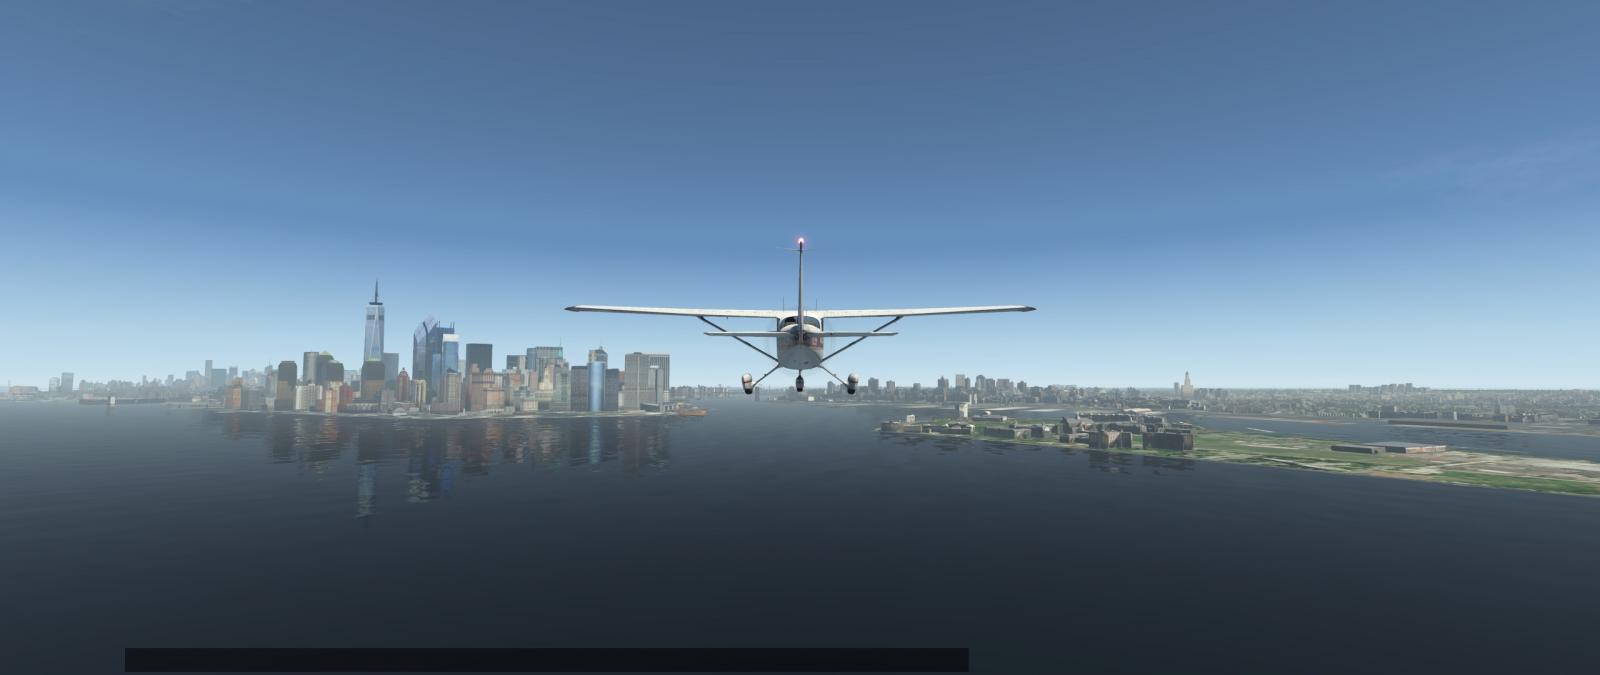 Fly Lua Xplane